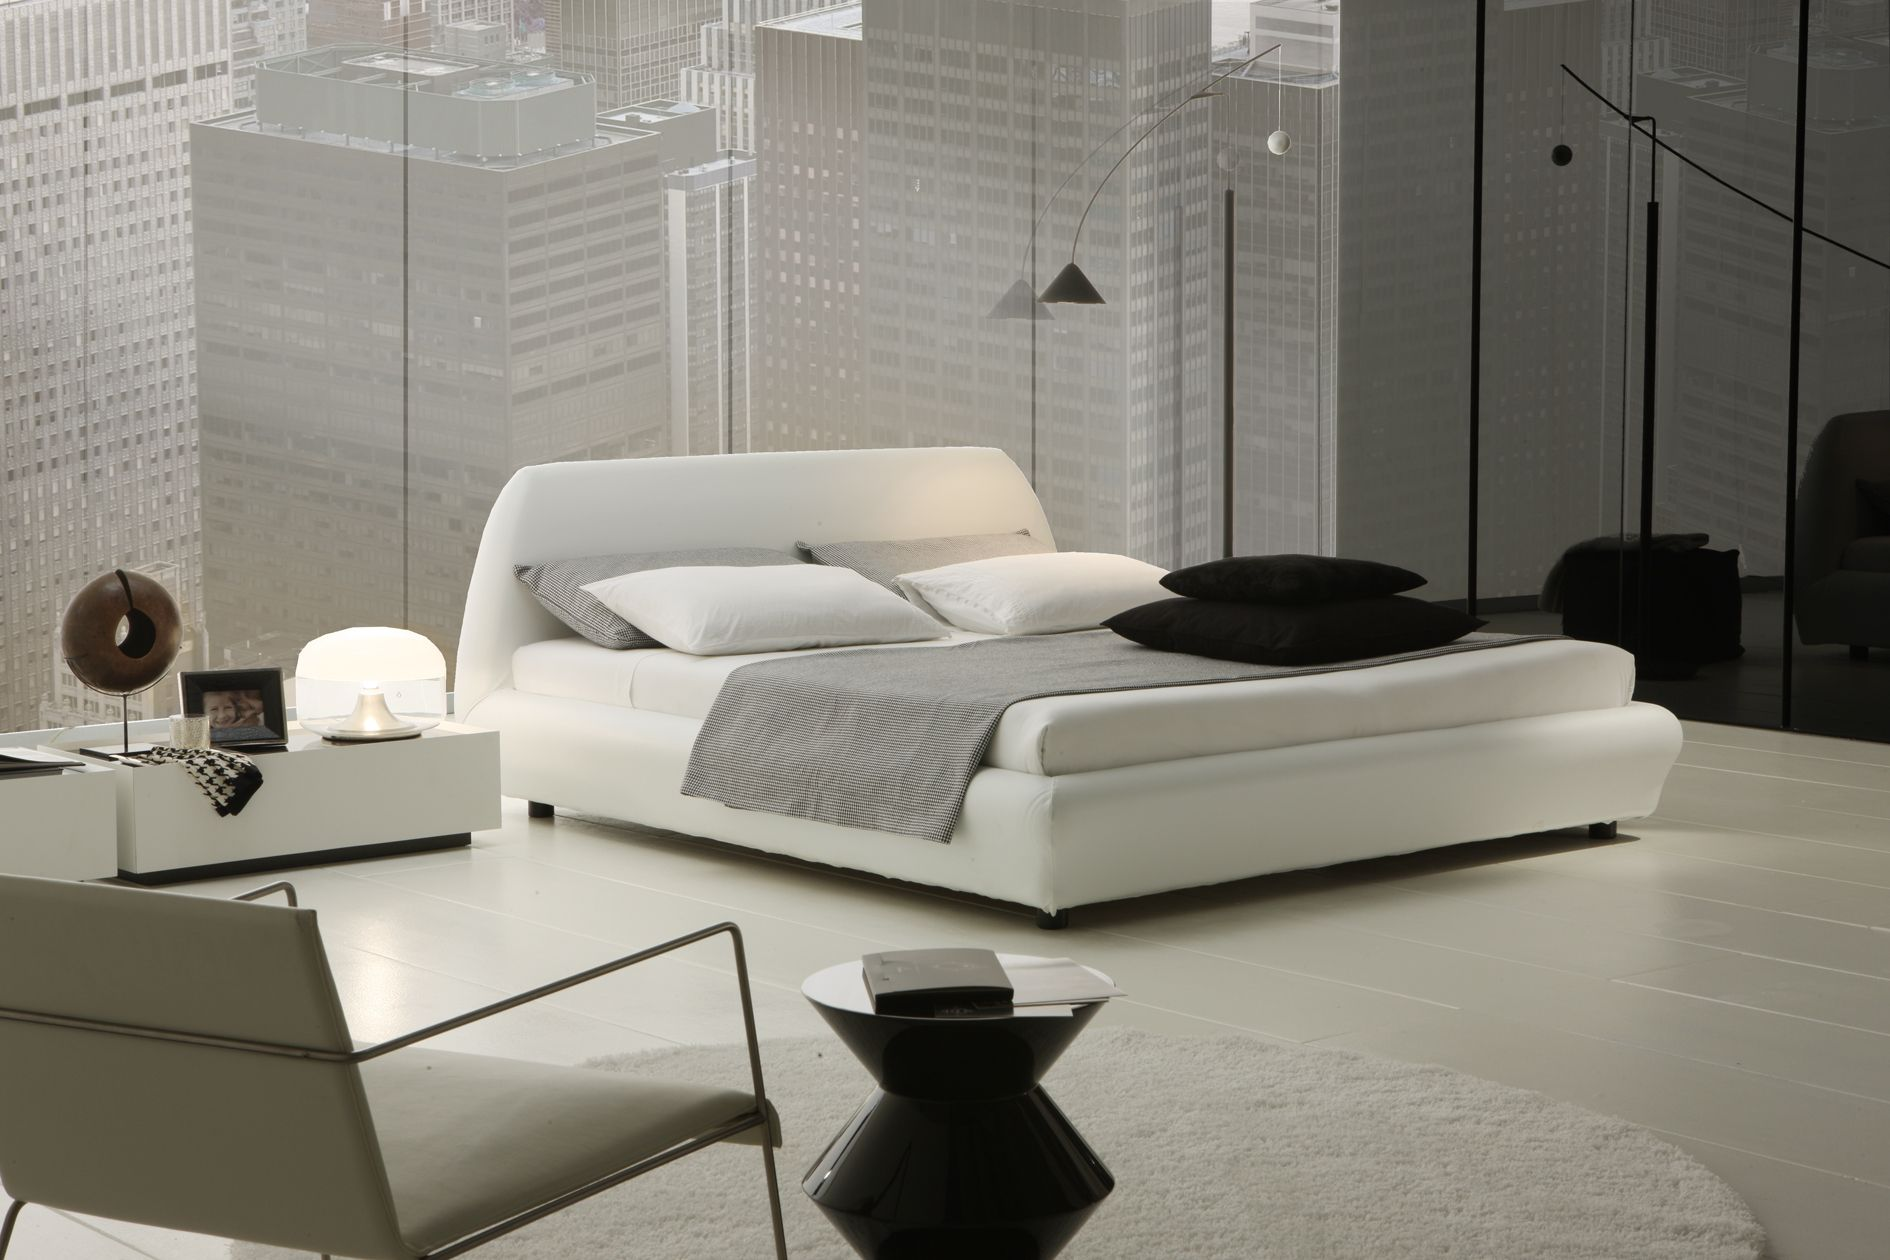 Cute teenage girl bedroom ideas bedrooms minimalist and modern